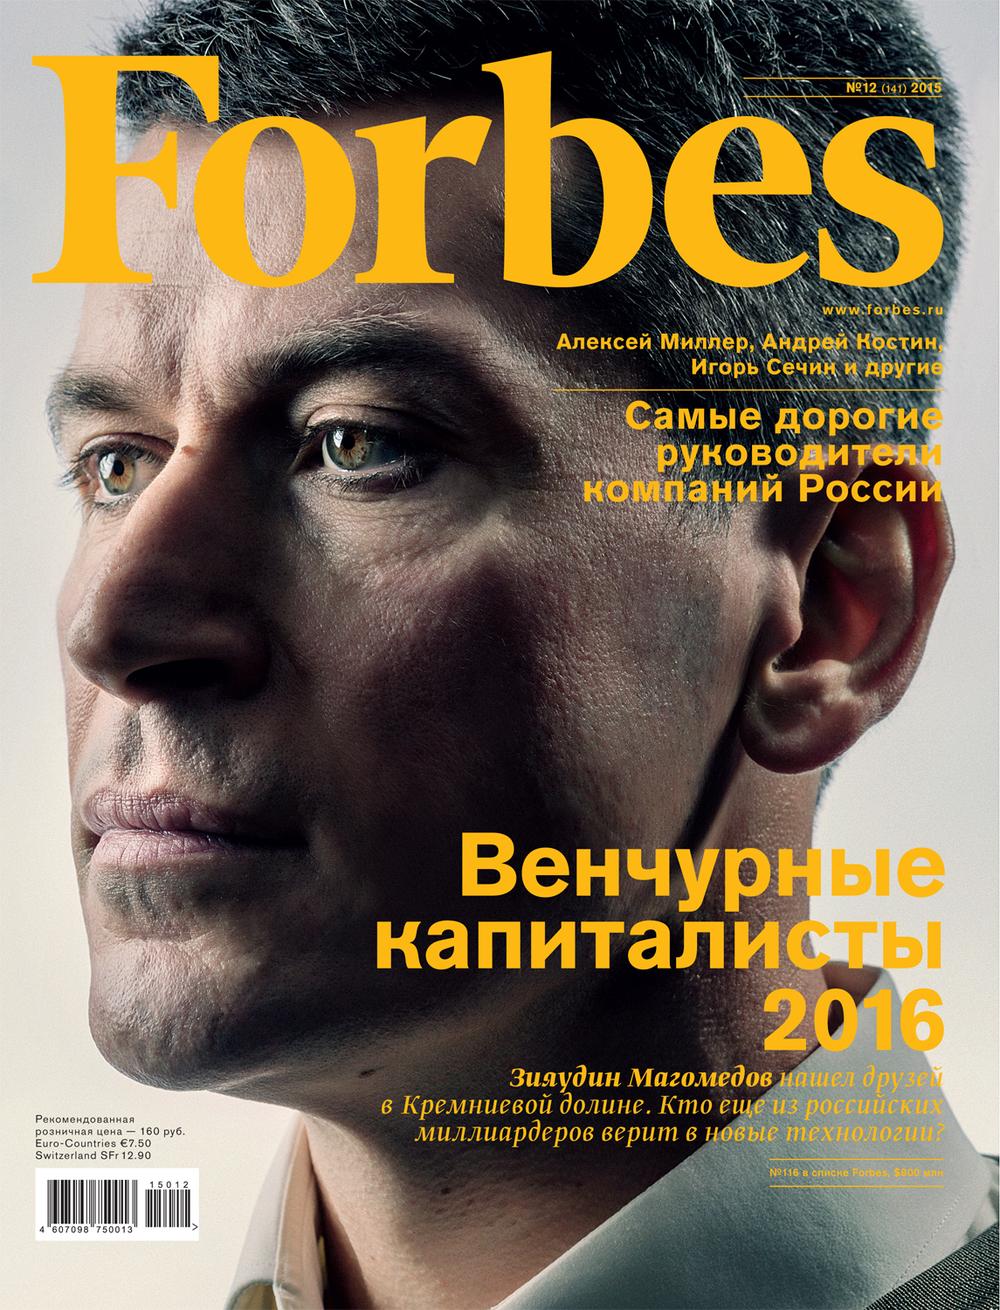 Magomedov_Ziyavudin_Forbes.jpg